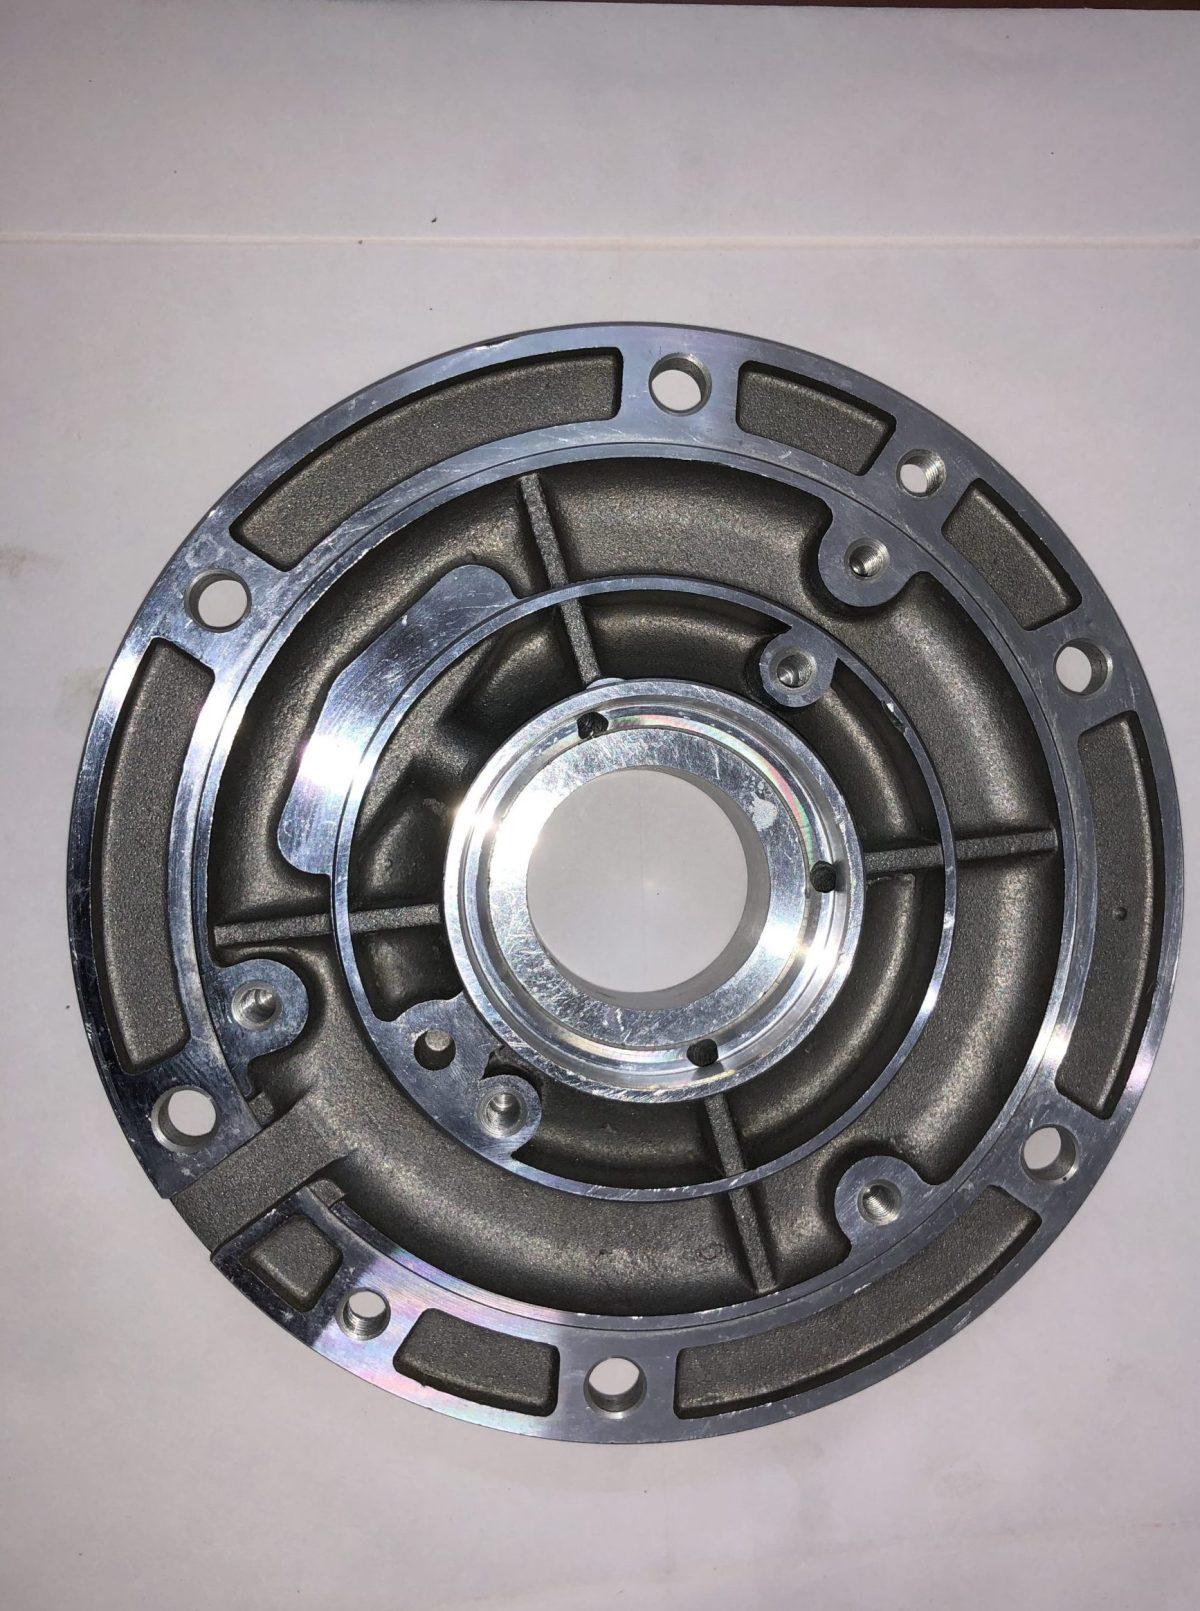 CRANK SUPPORT 3LD 510 , LDA 510 FOR lombardini 3LD 510 and 3LD  450 single cylinder Diesel engine . Lombardini lda 510 , 3ld 510. Greaves , ape piaggio. 6LD 360 6LD 325